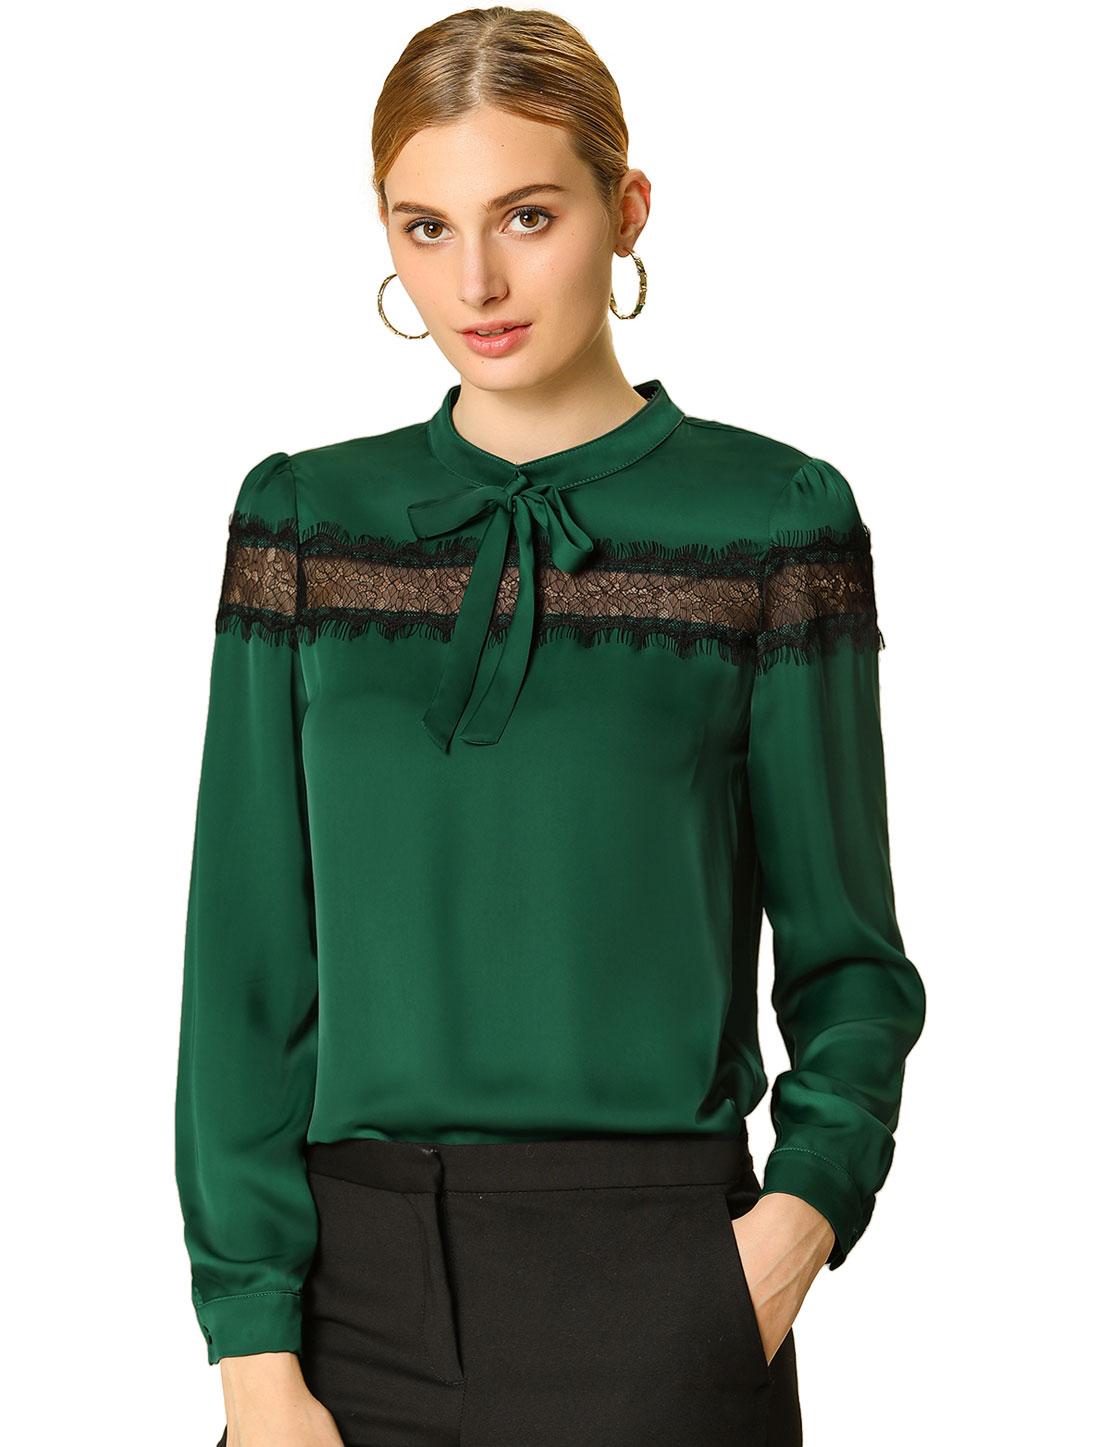 Allegra K Women's Elegant Long Sleeve Tie Neck Shirt Lace Patchwork Top Green XS